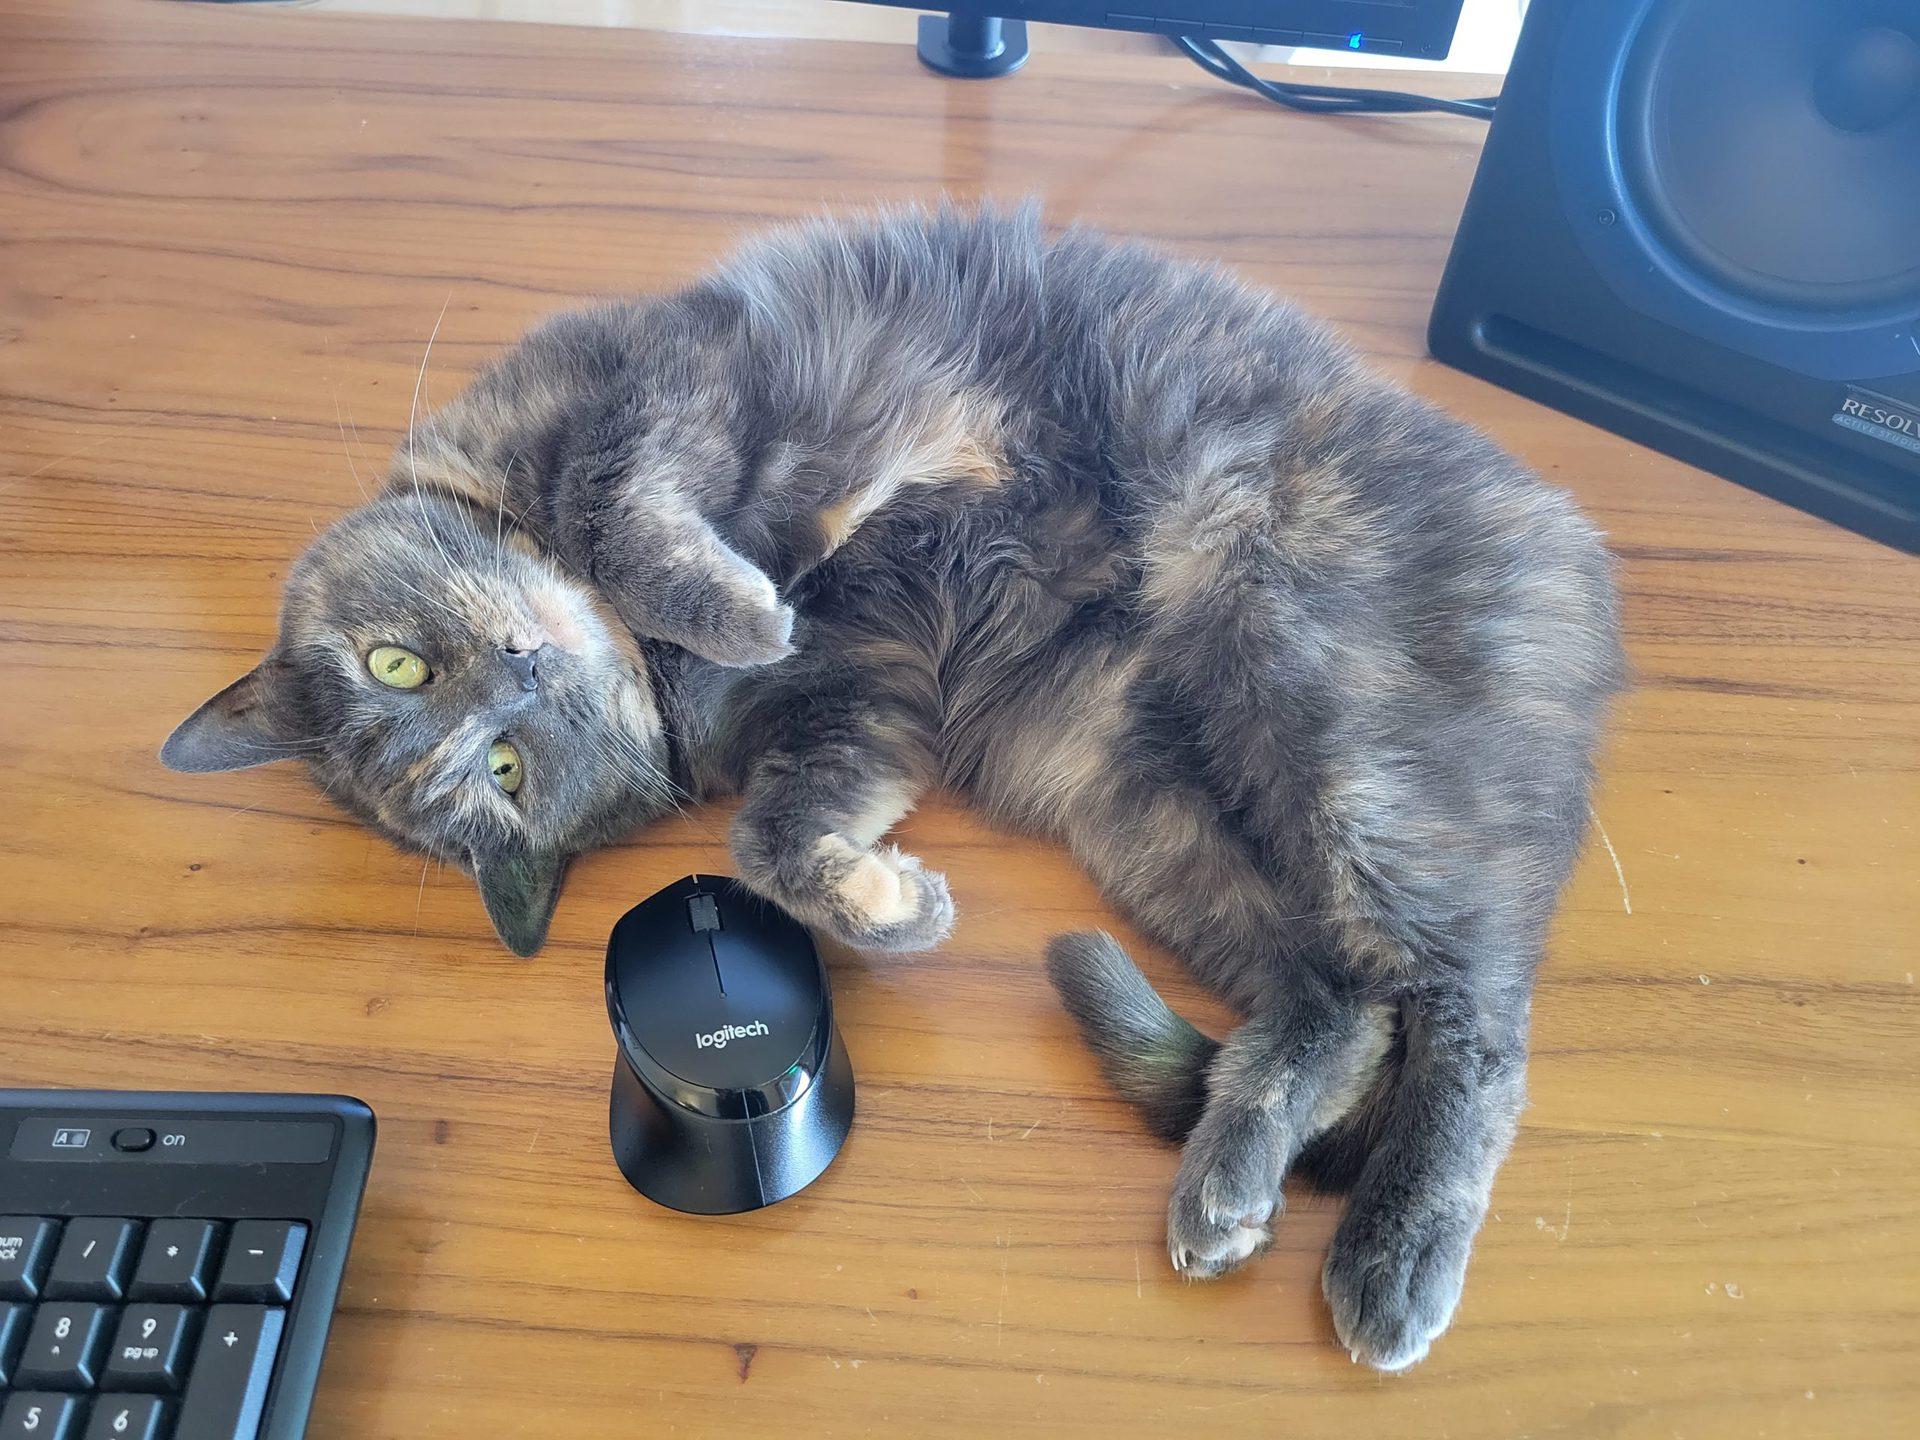 Samsung Galaxy S21 12MP Cat Photo